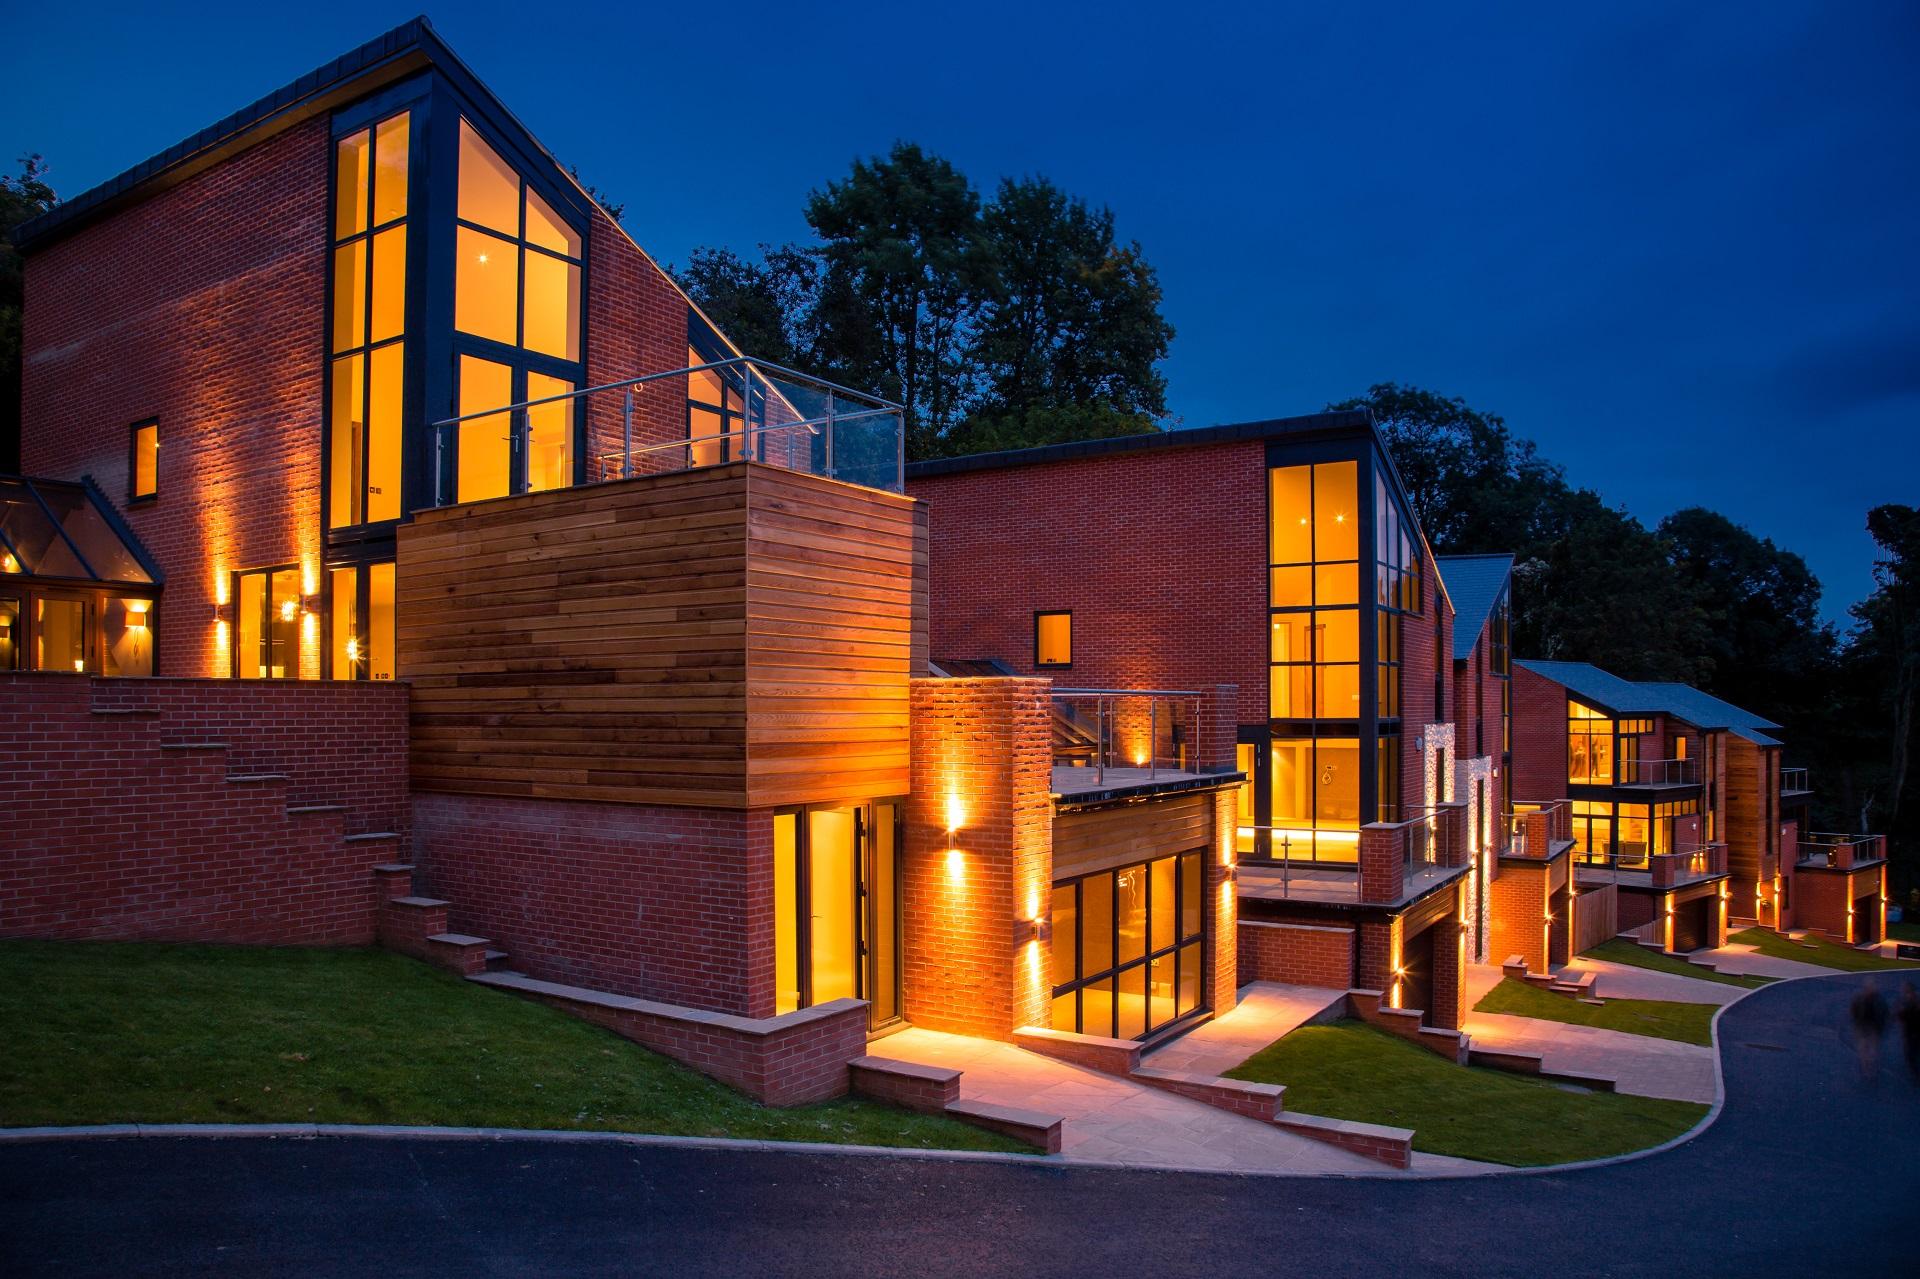 Alexander Park, The Crescent, Nottingham, Executive designer home development